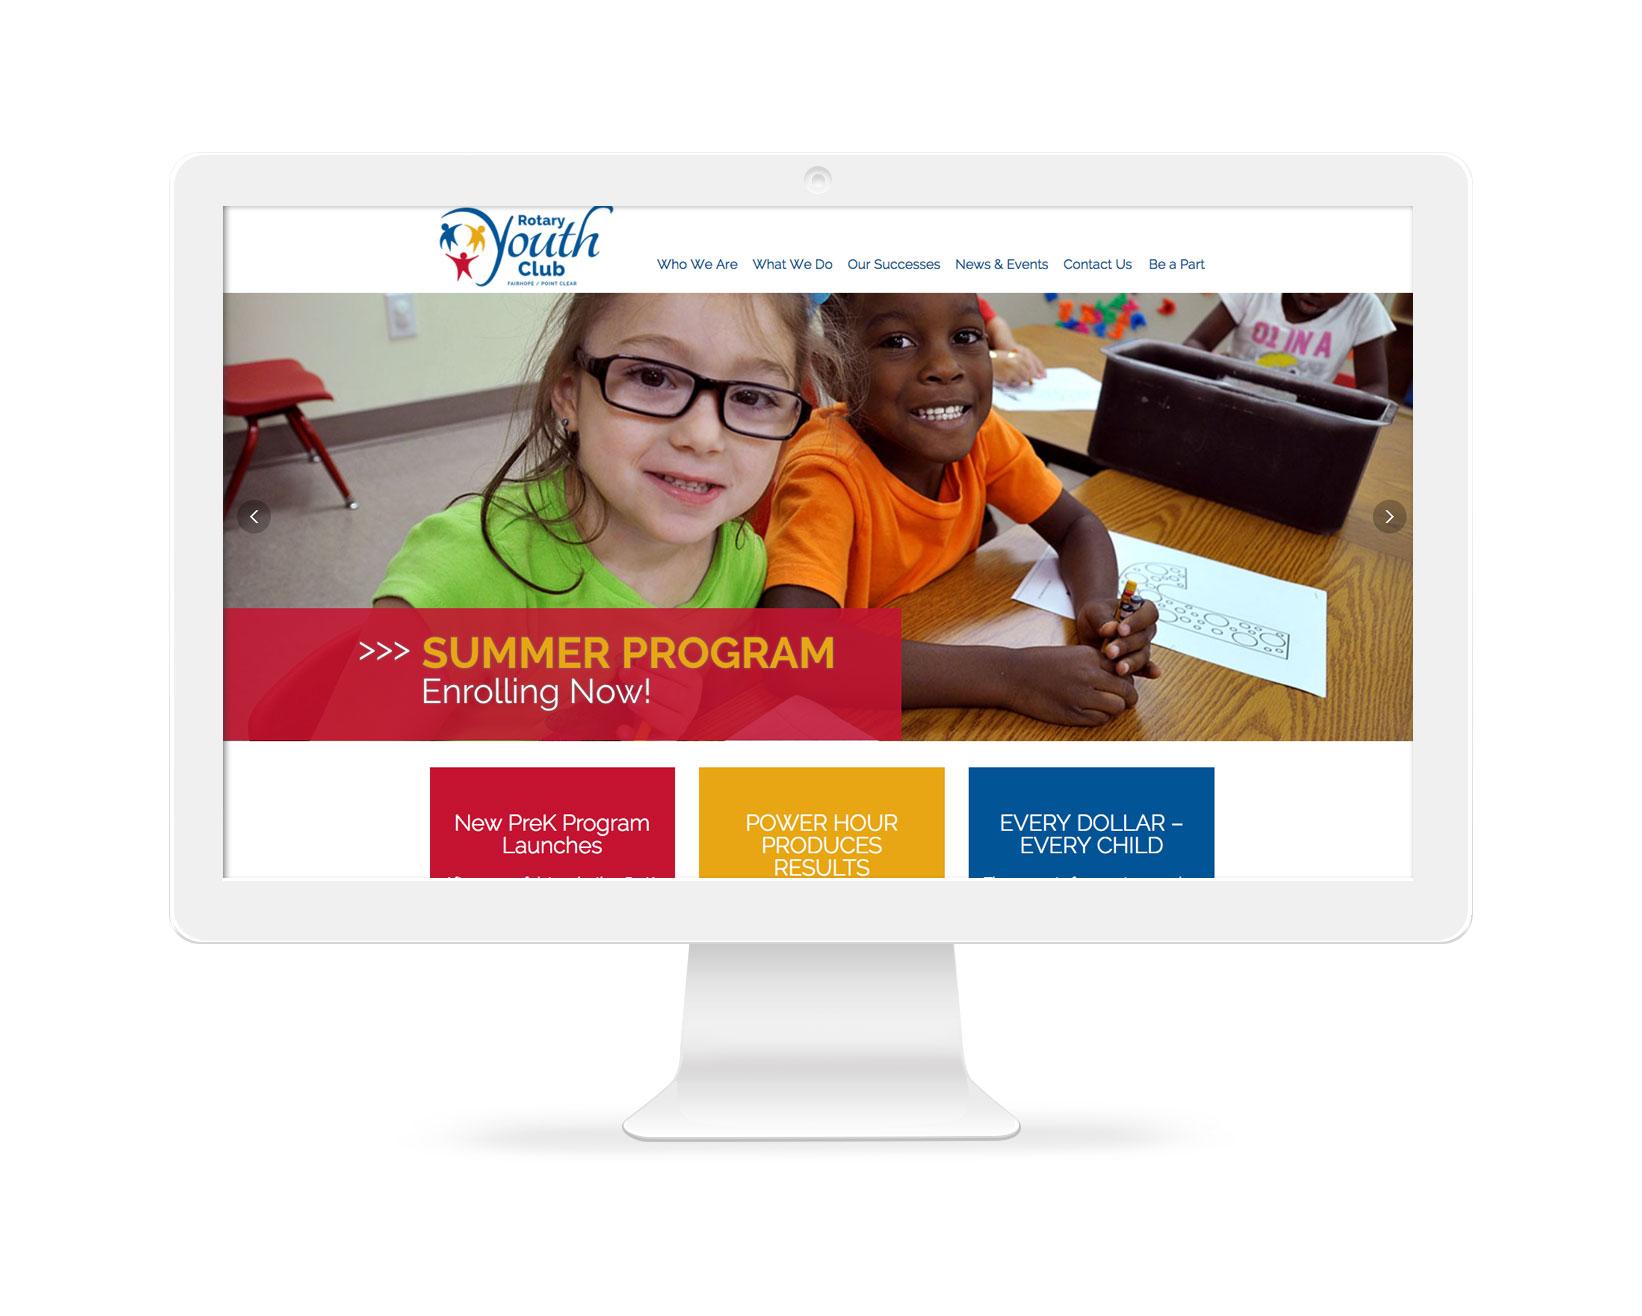 Rotary Youth Club